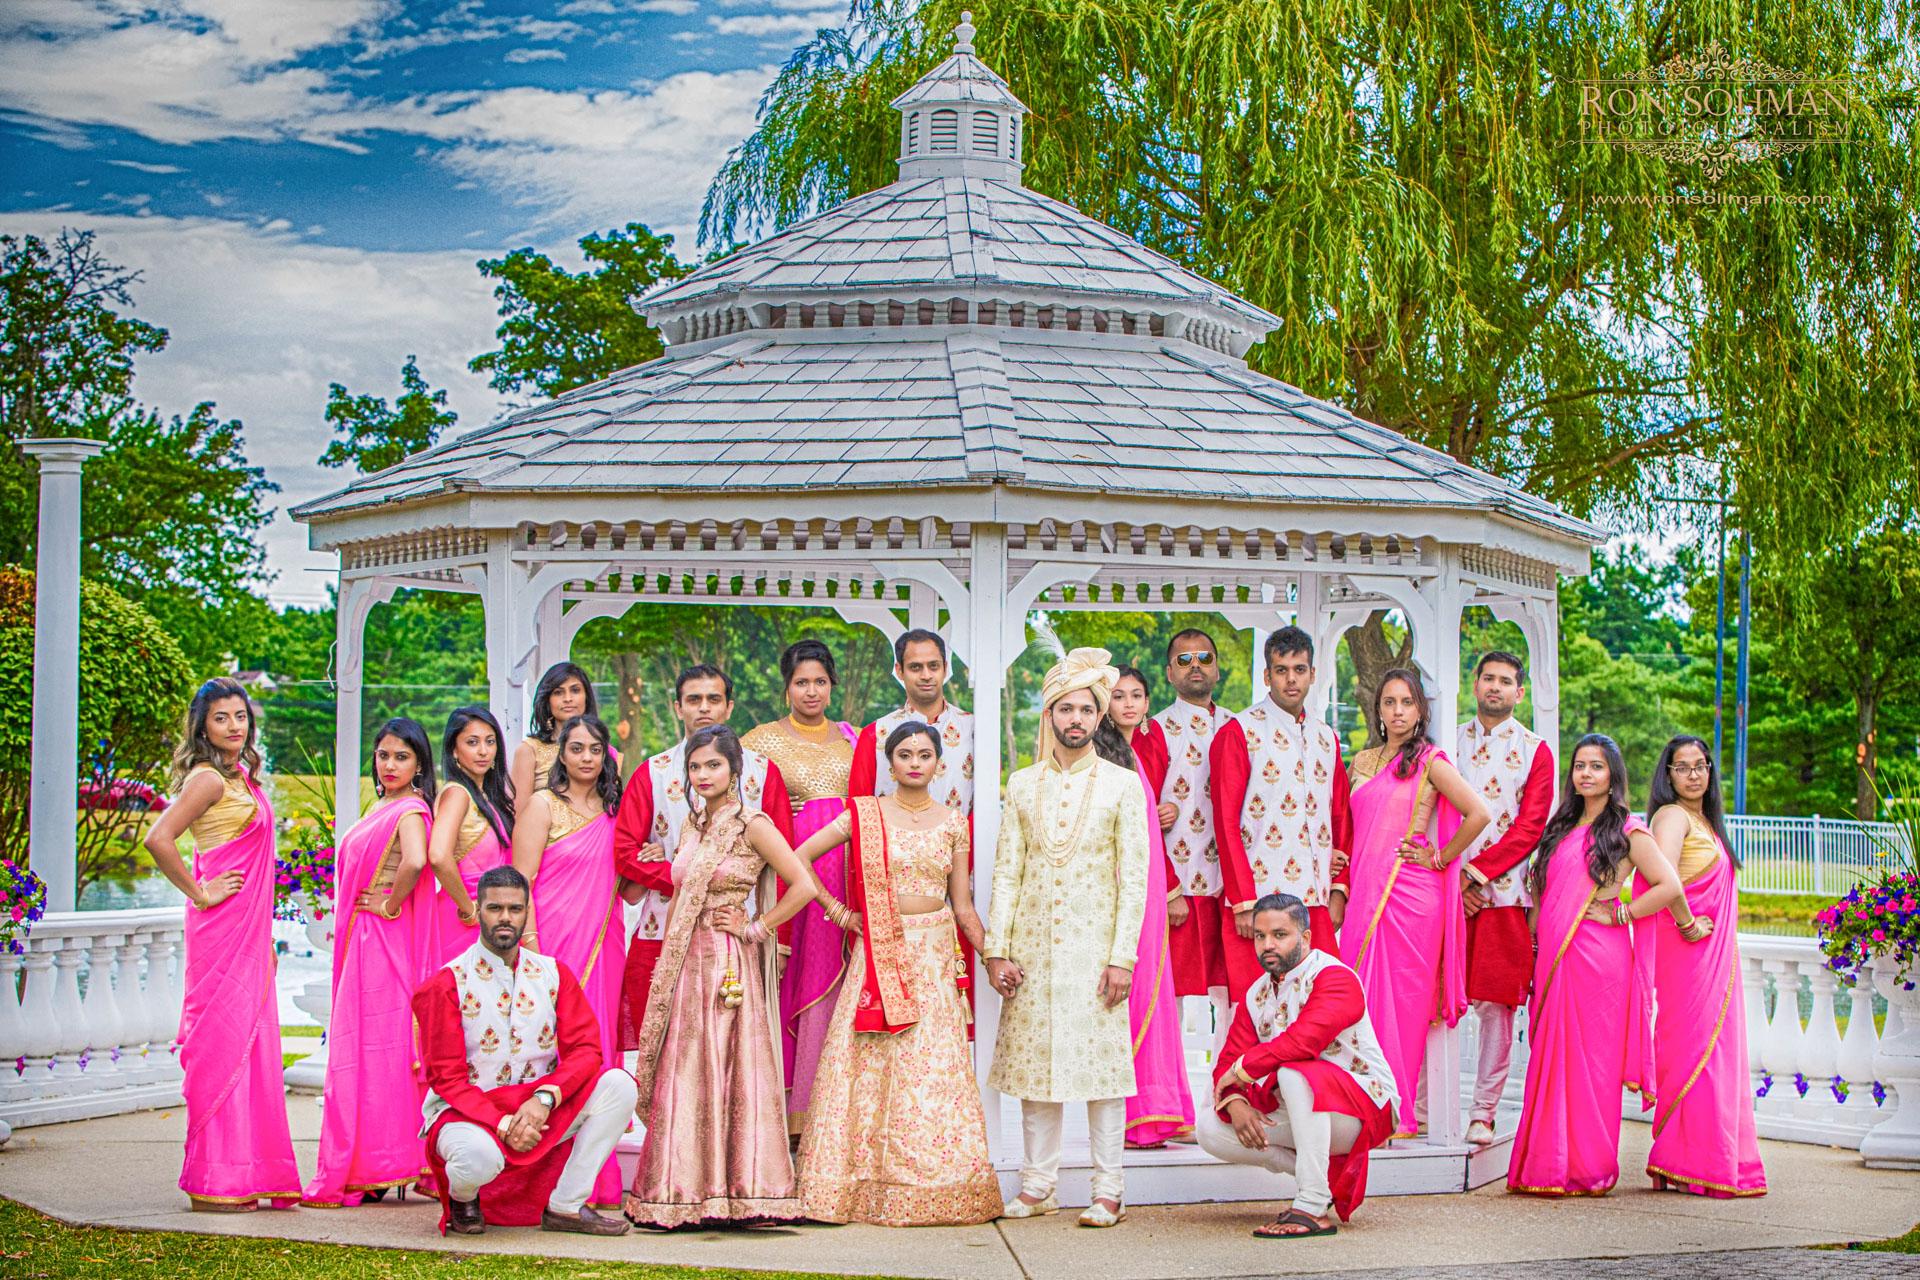 MANSION ON MAIN STREET WEDDING MA 6